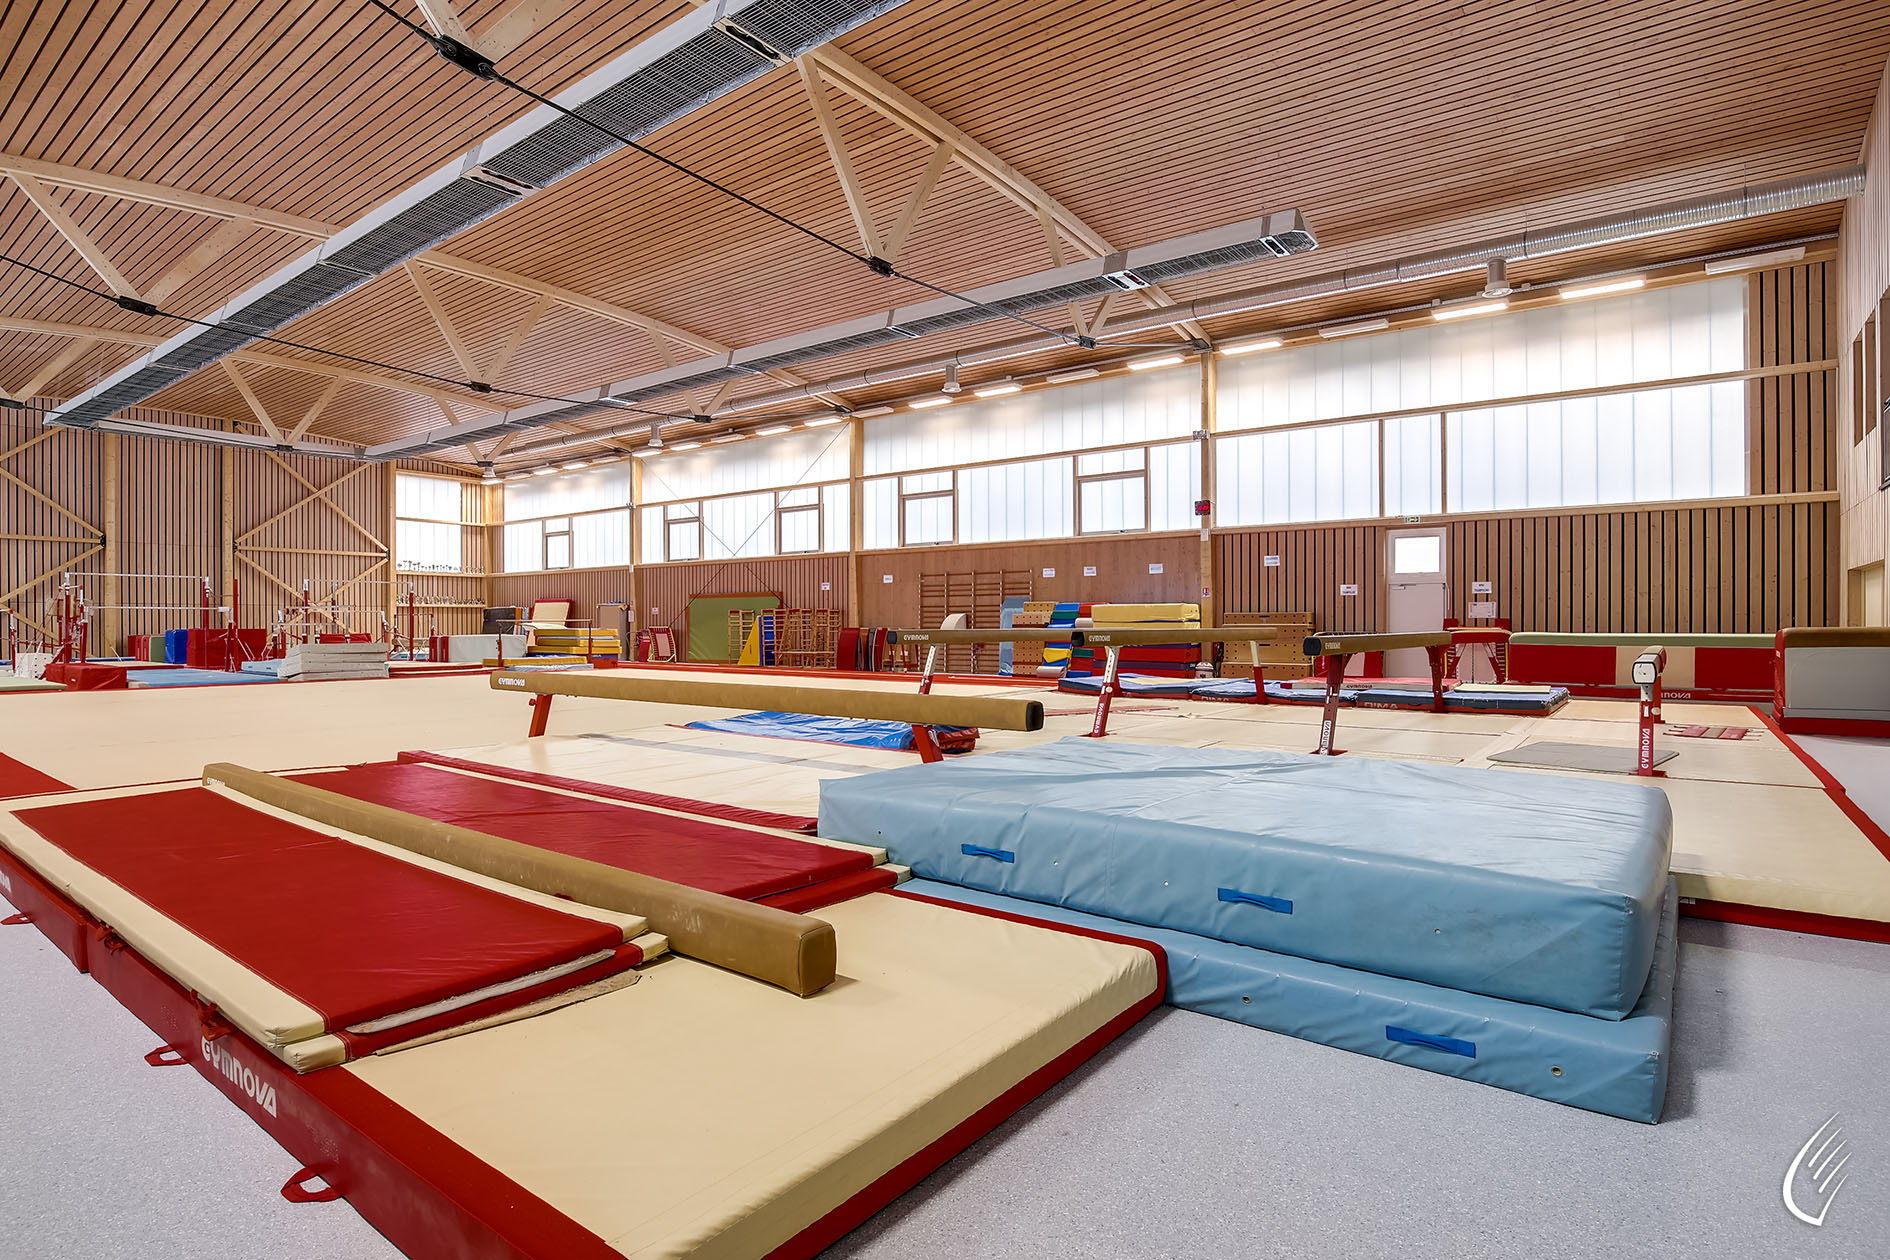 Salle De Gymnastique Rueil Malmaison 92 Concepteur